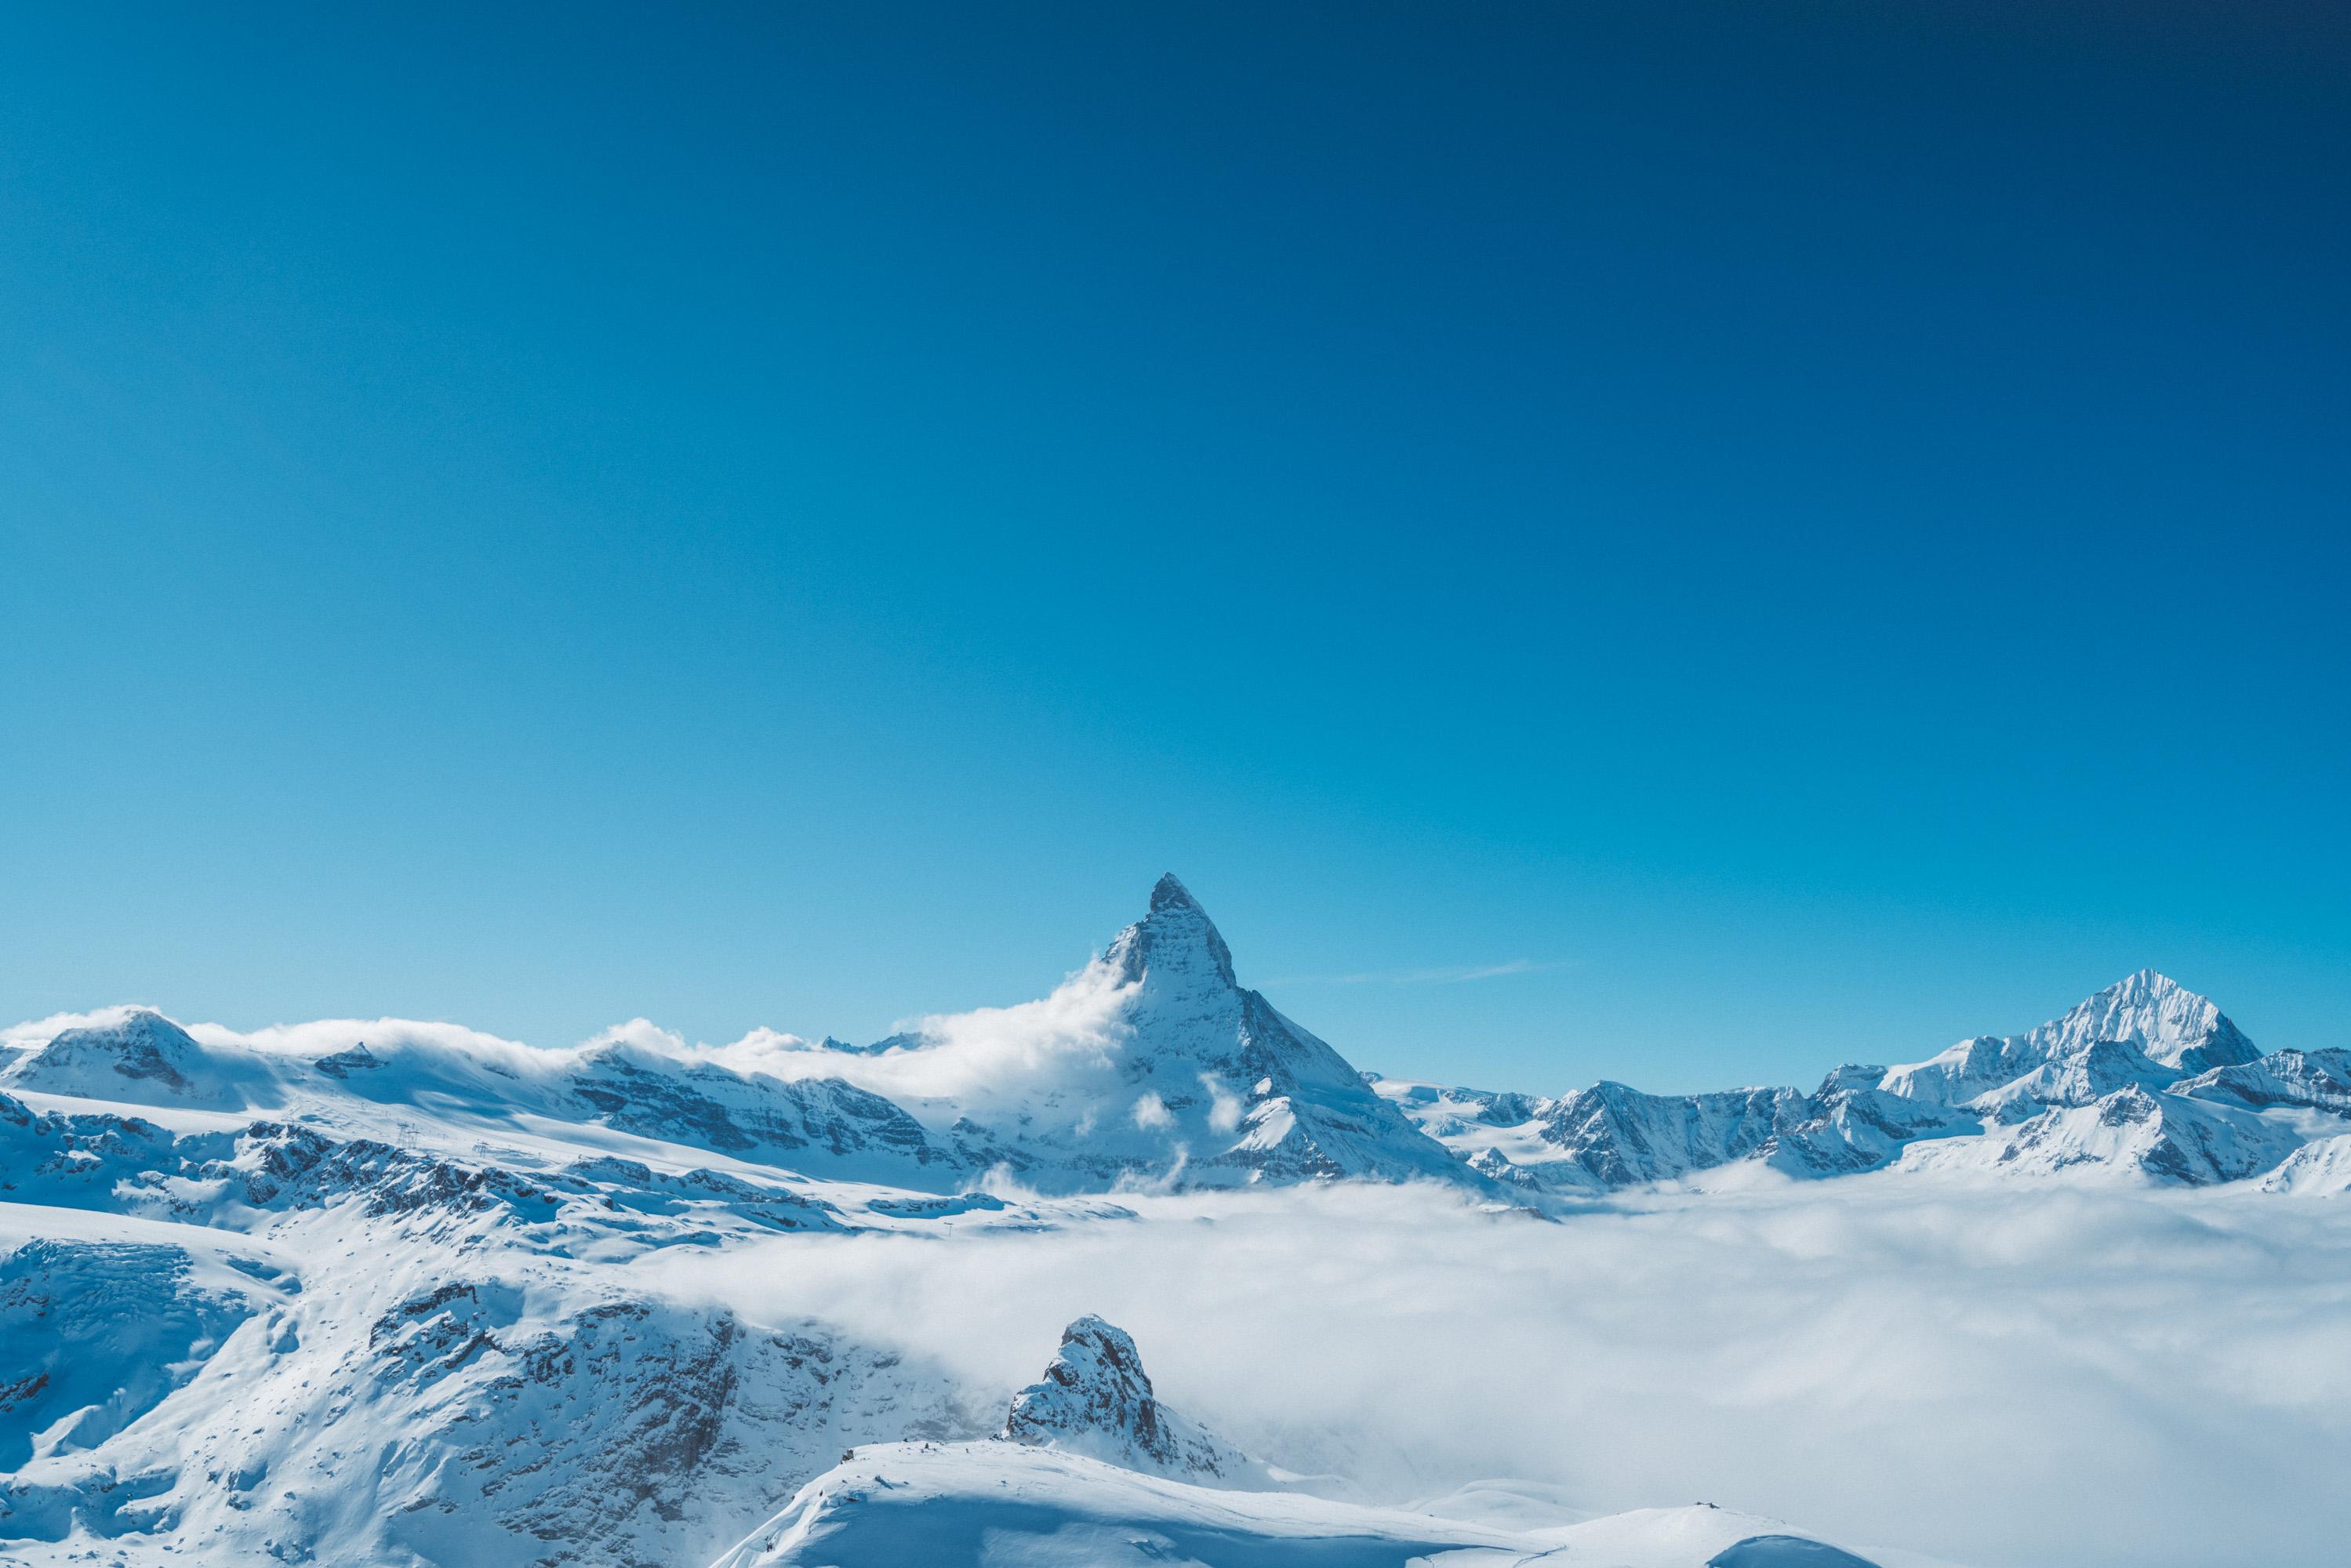 Matterhorn [David Tan]